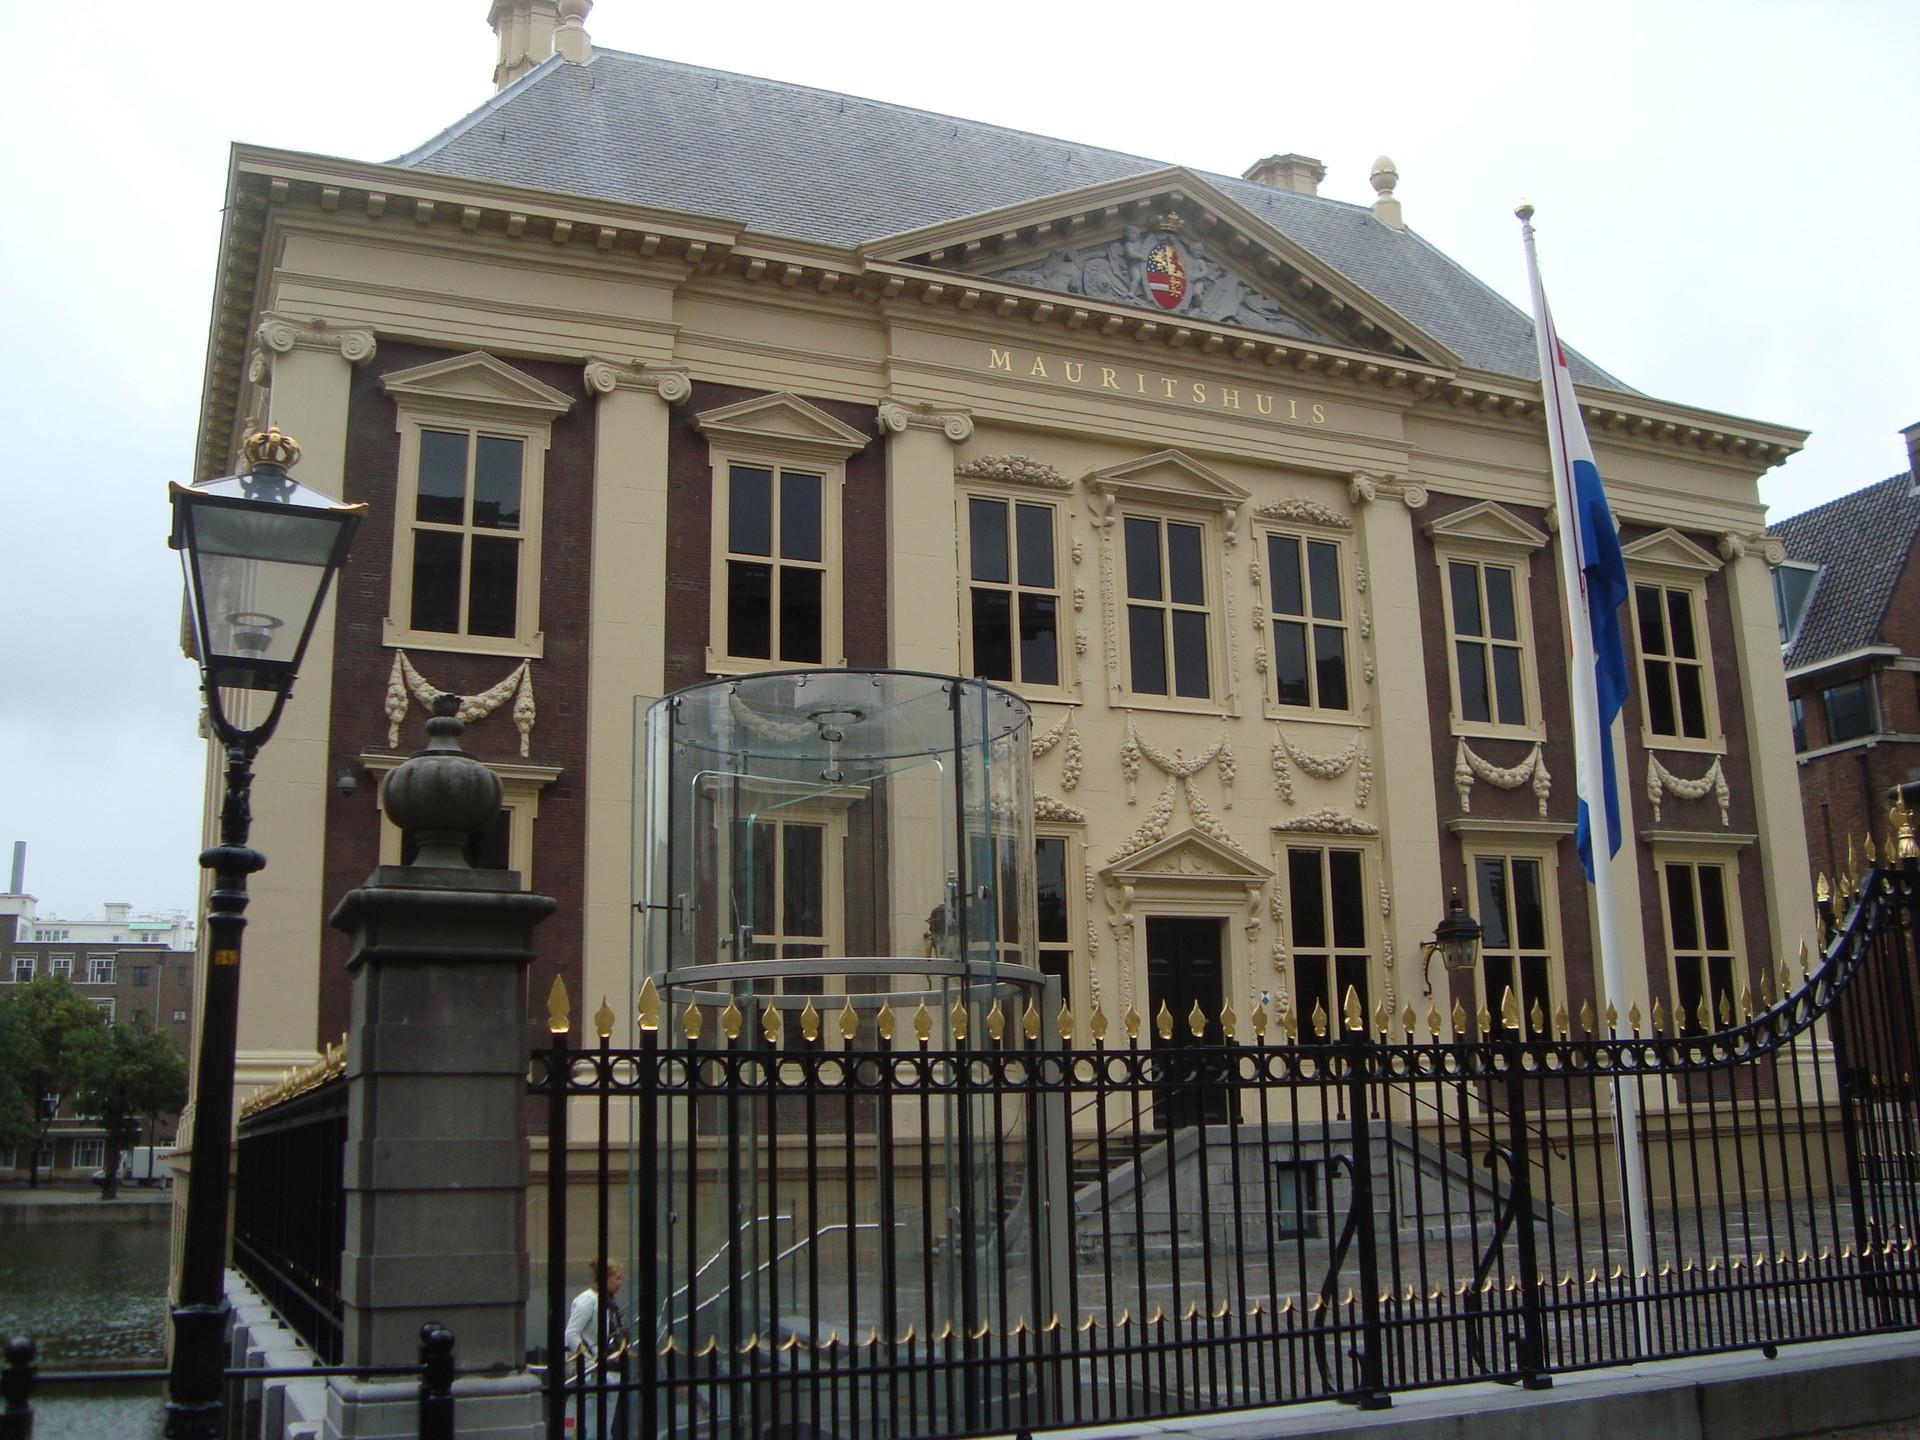 Mauritshuis - Art Museum